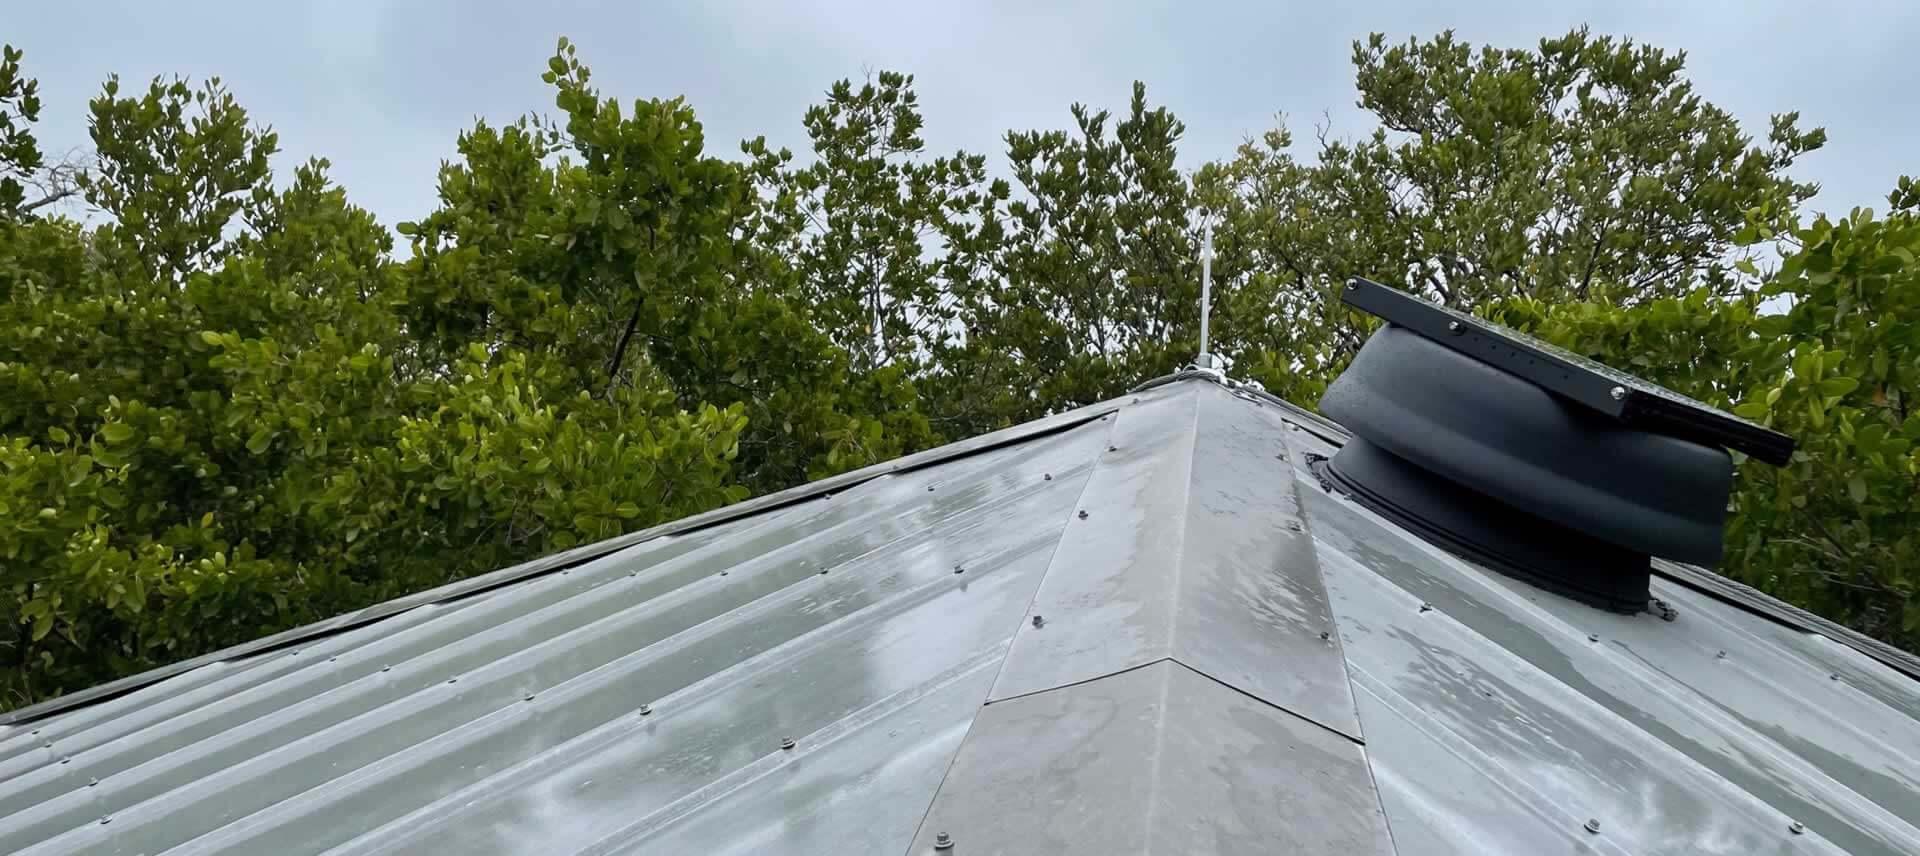 Lightning Protection Rods, Florida